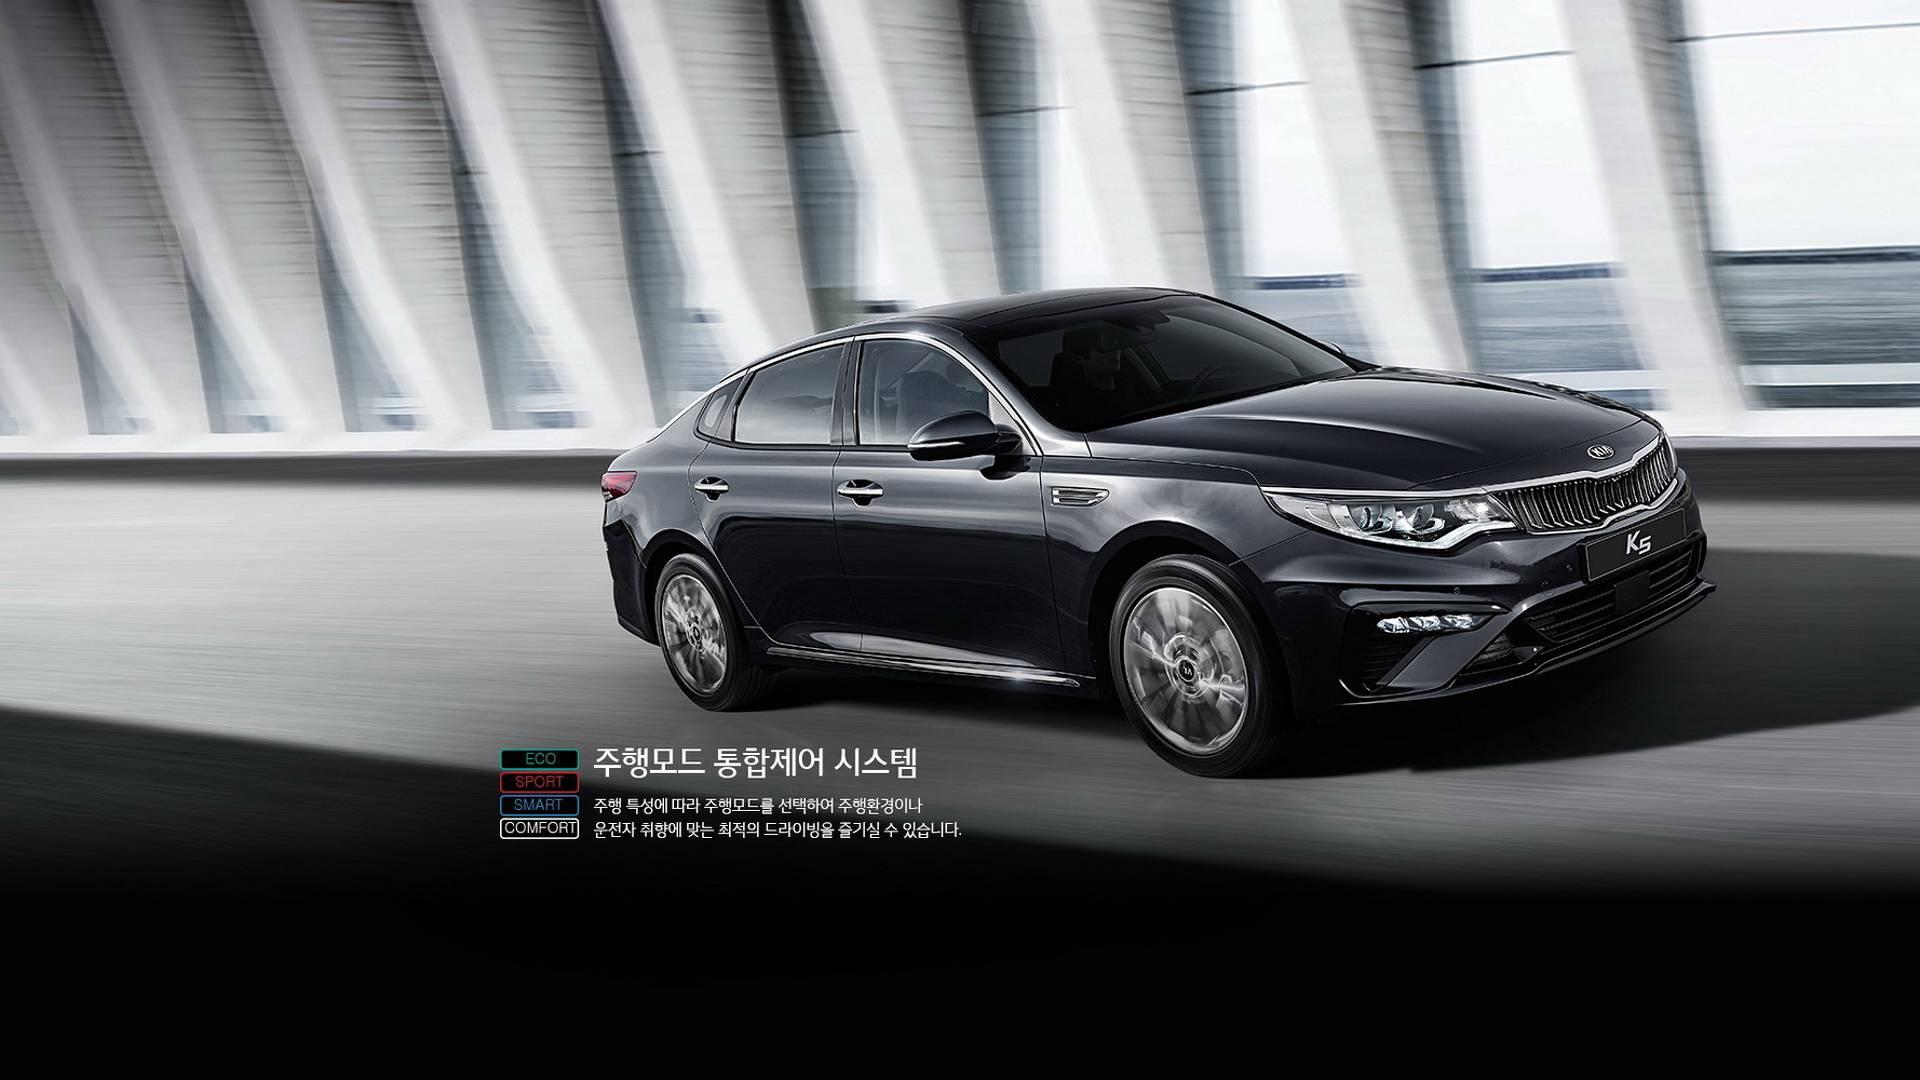 2019 kia optima facelift says hello in south korea. Black Bedroom Furniture Sets. Home Design Ideas